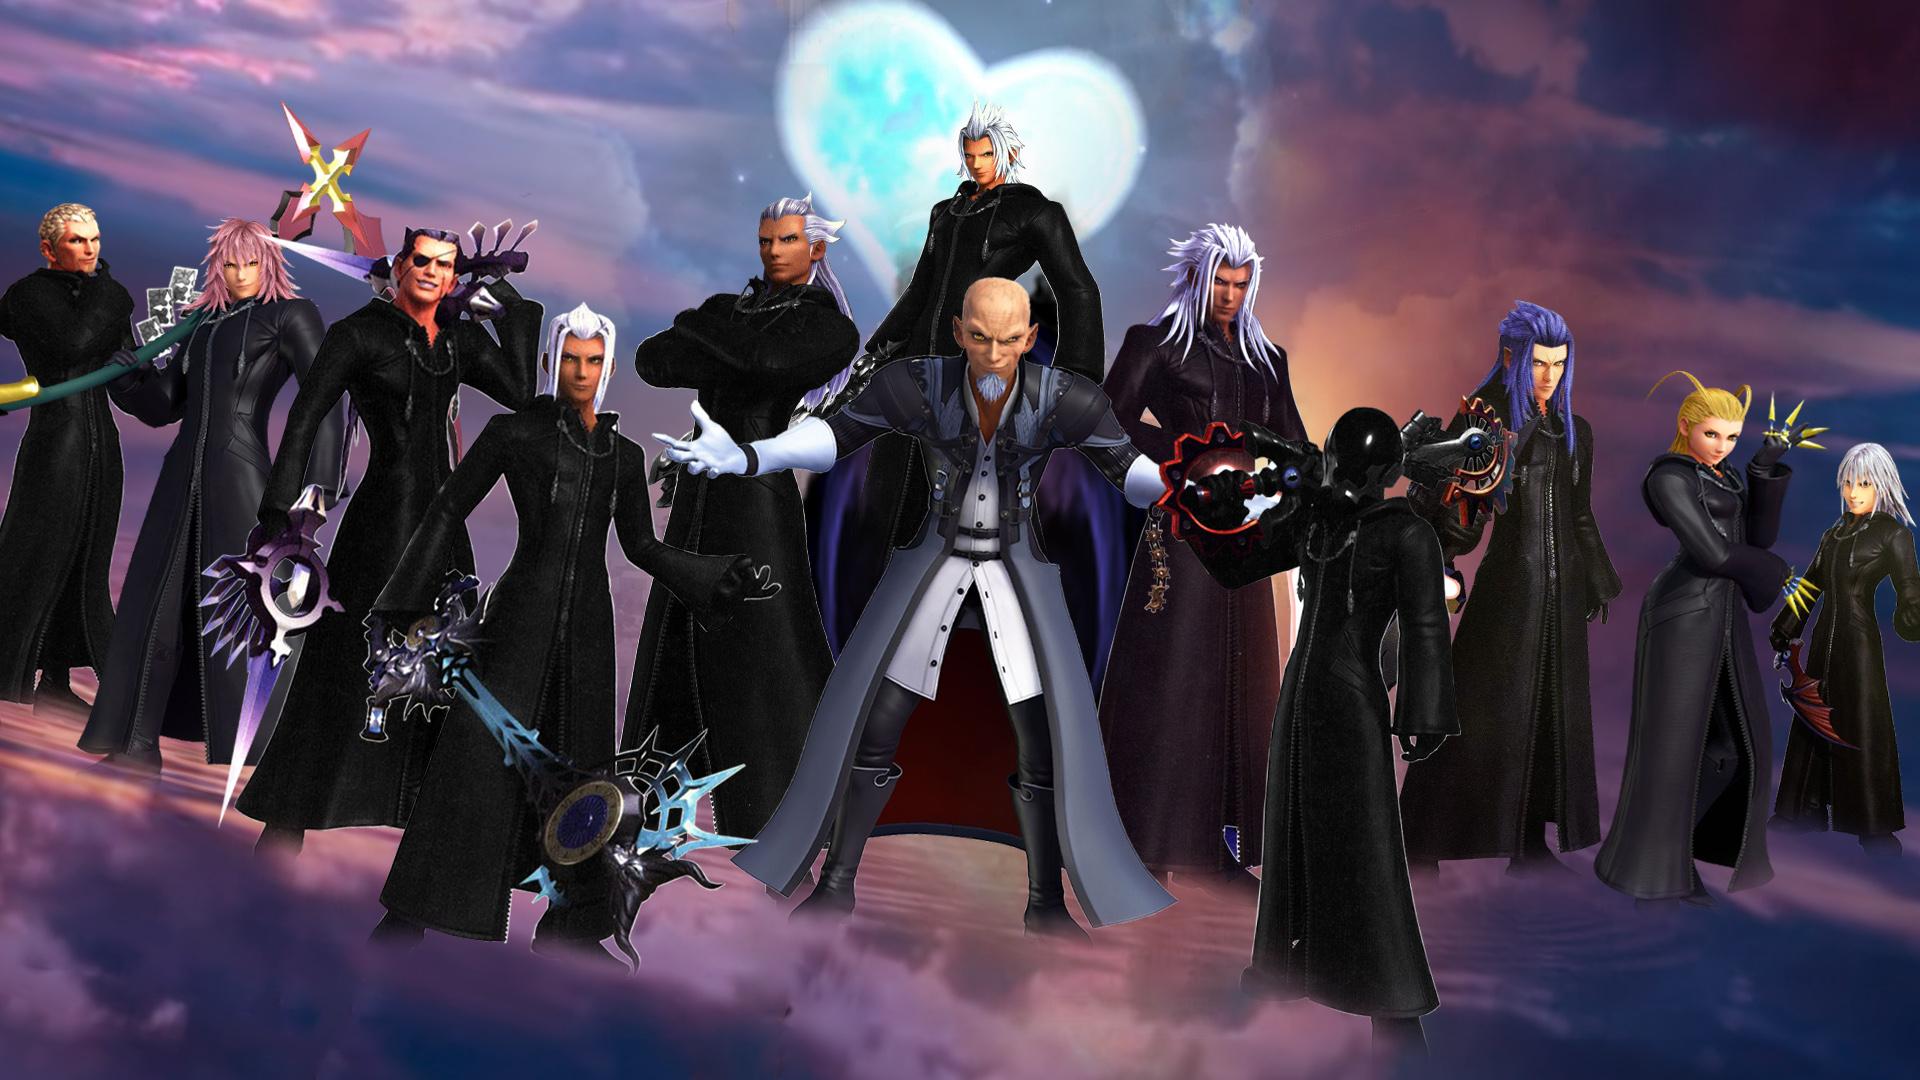 Kingdom Hearts Iii Wallpaper Seekers Of Darkness By The Dark